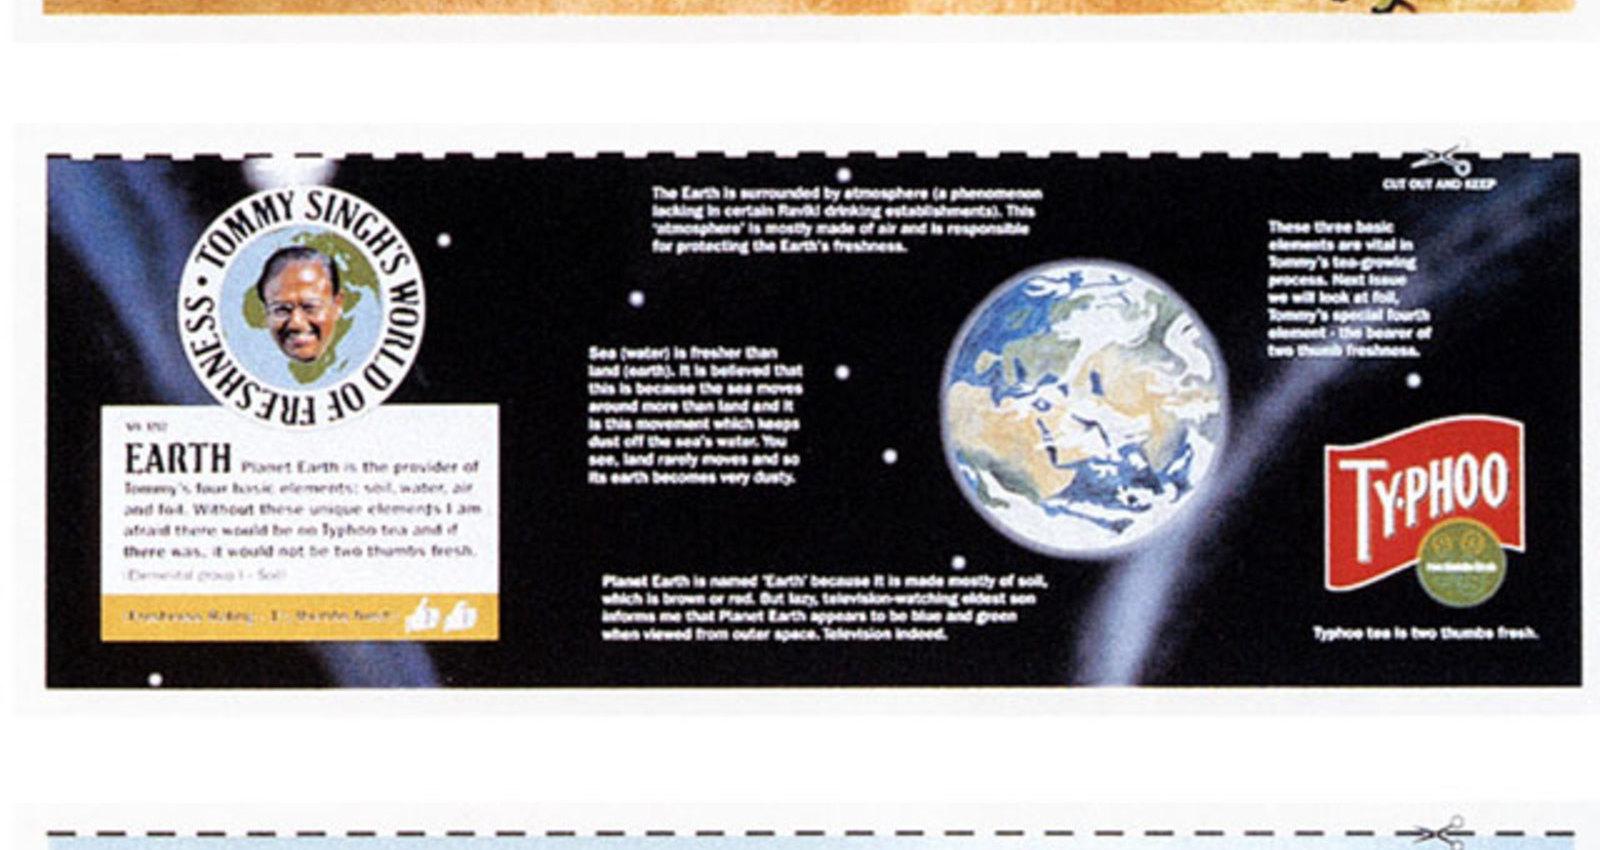 STIP ADS VARIOUS: EARTH, PYRAMID, ETC...